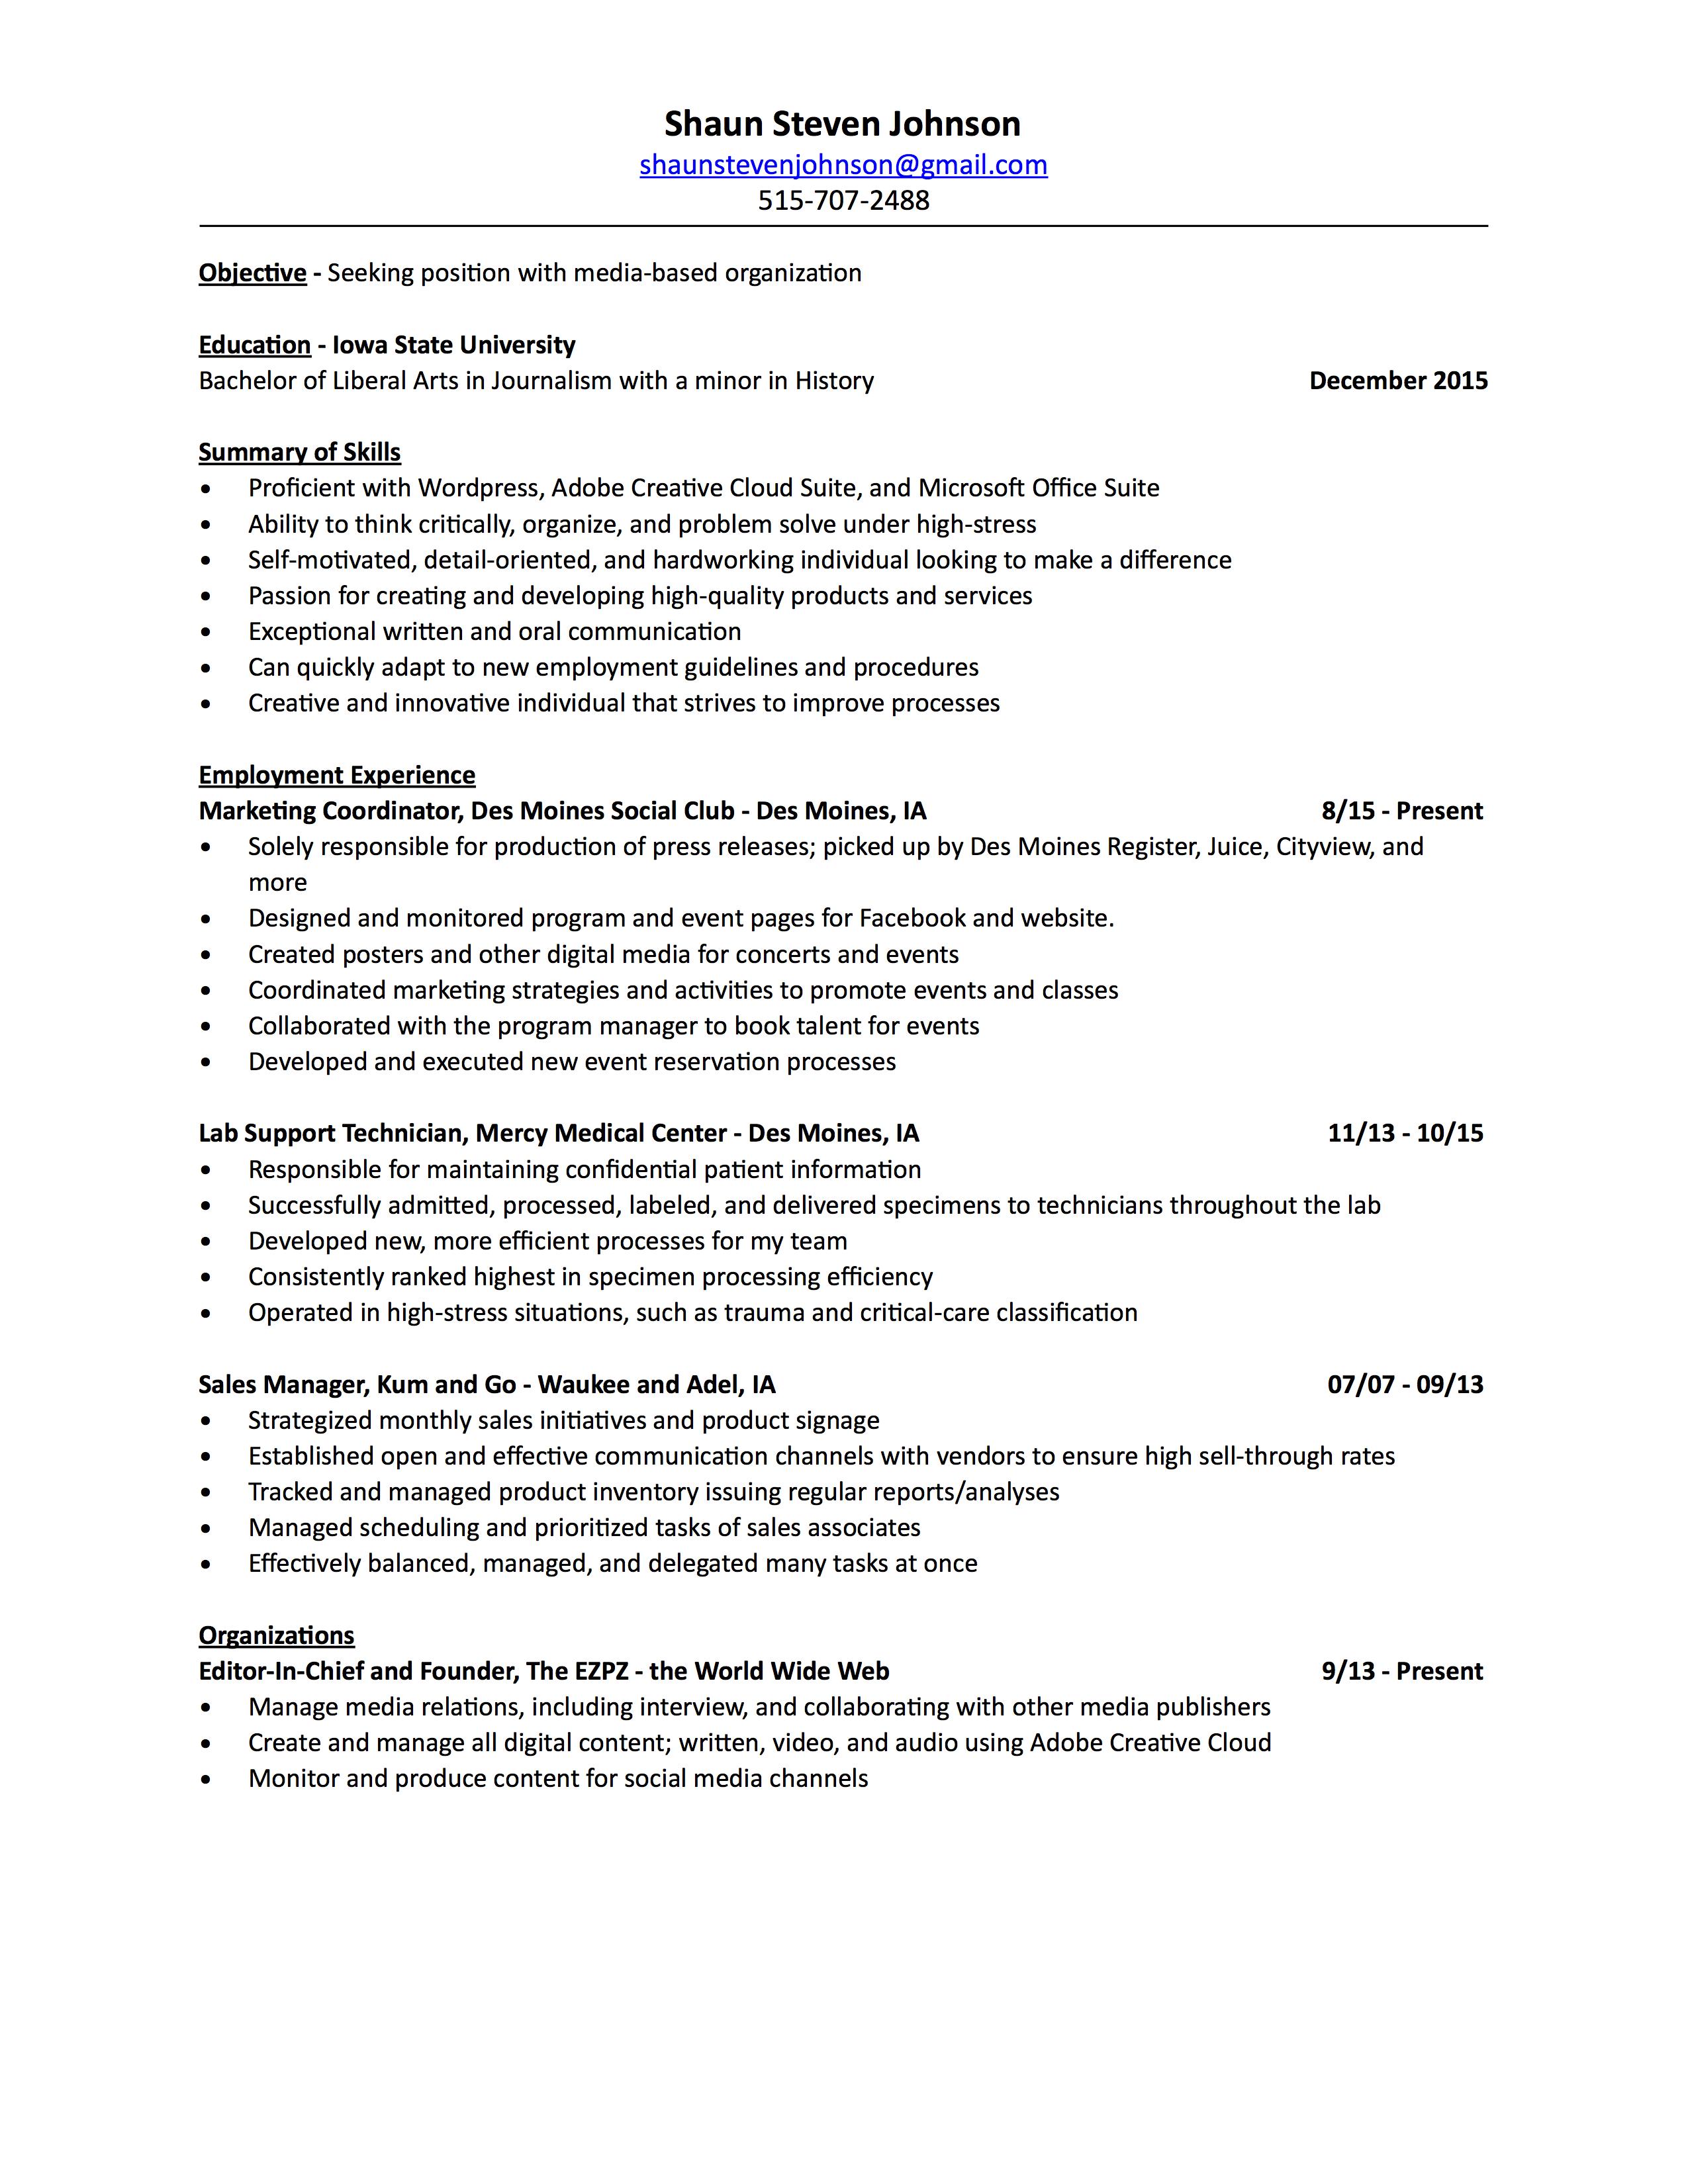 Shaun Johnson 2016 Resume